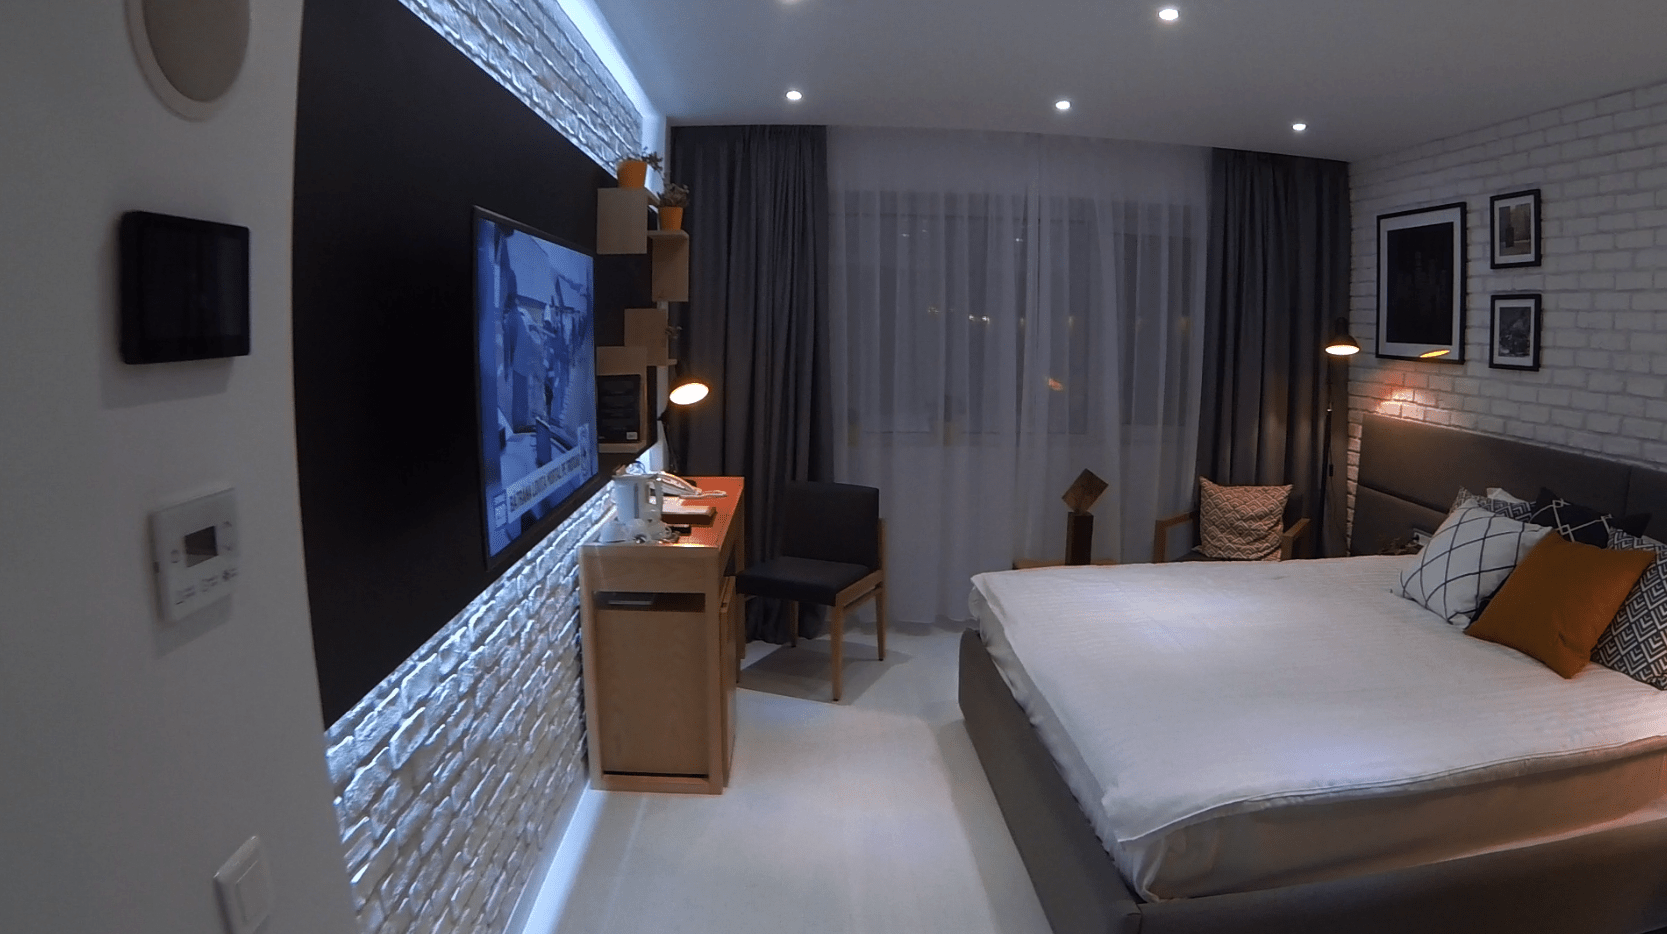 HOTEL ROOM, BUCHAREST – NEW YORK INDUSTRIAL LOFT DESIGN | Studio inSIGN